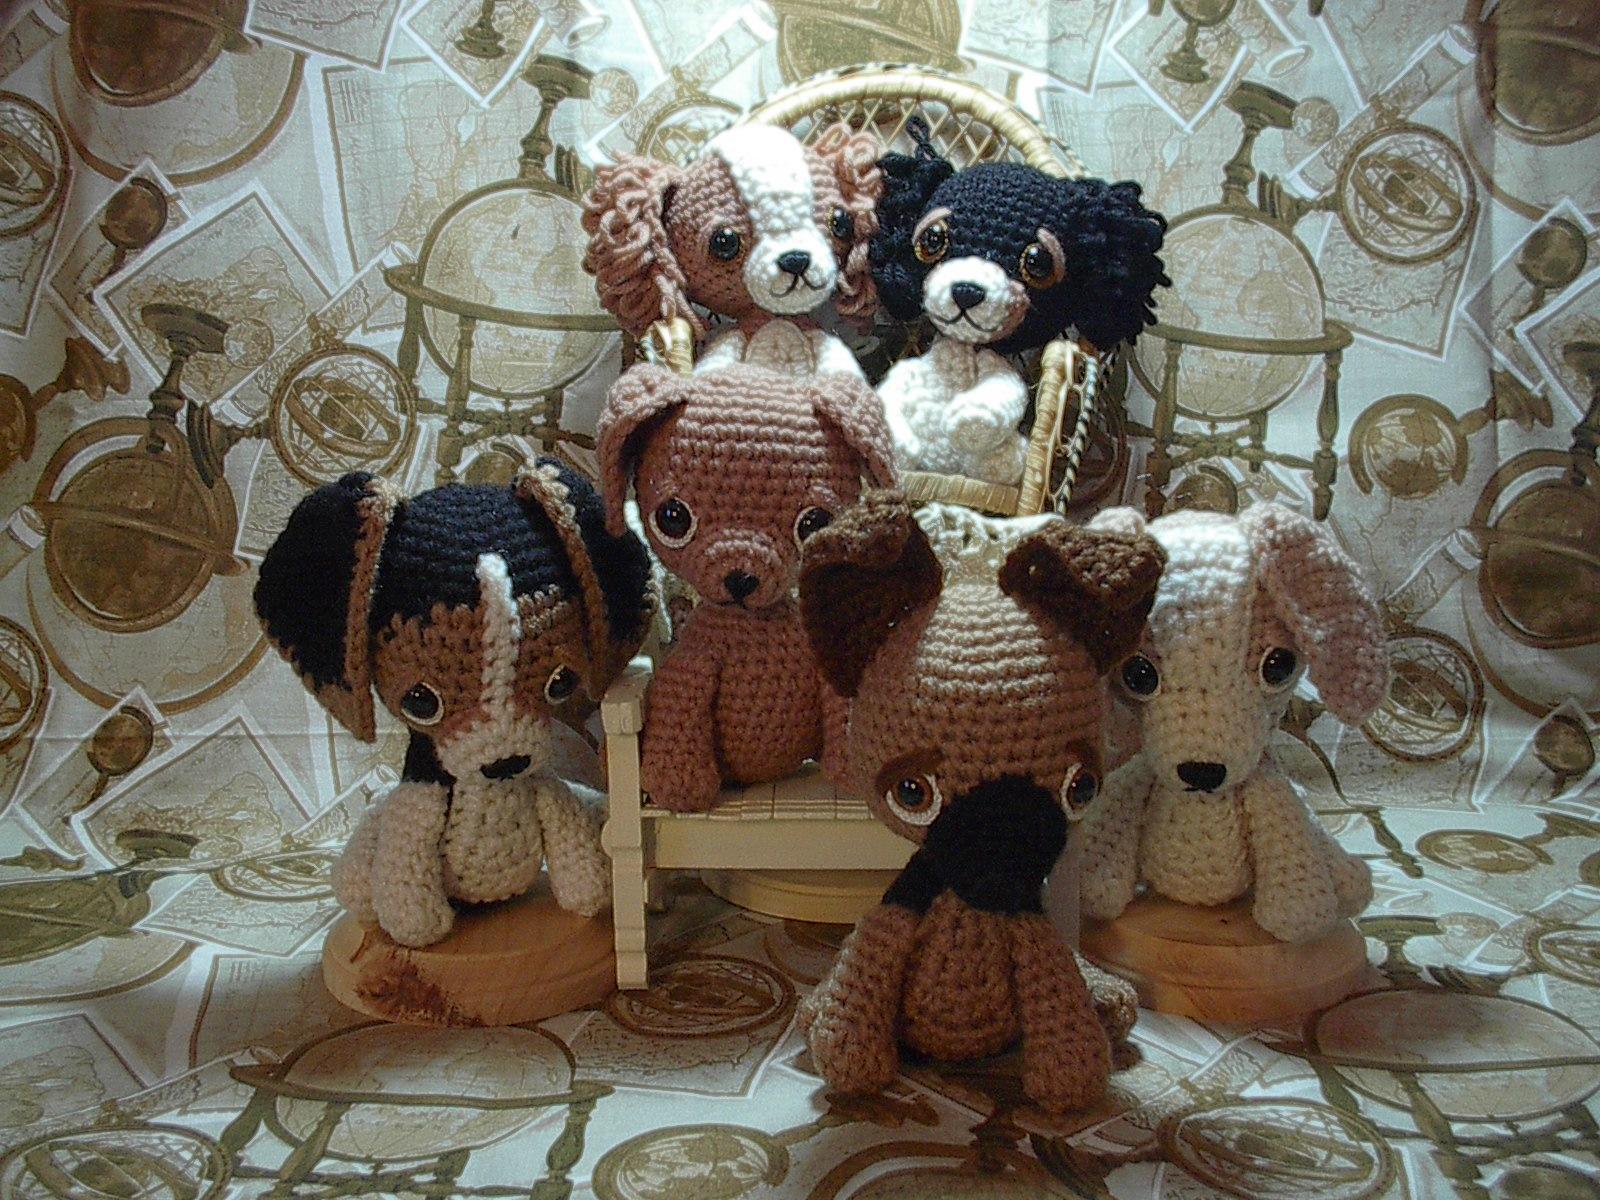 Crochet Patterns Free For Dogs : 2000 Free Amigurumi Patterns: Puppy patterns: Shepherd ...